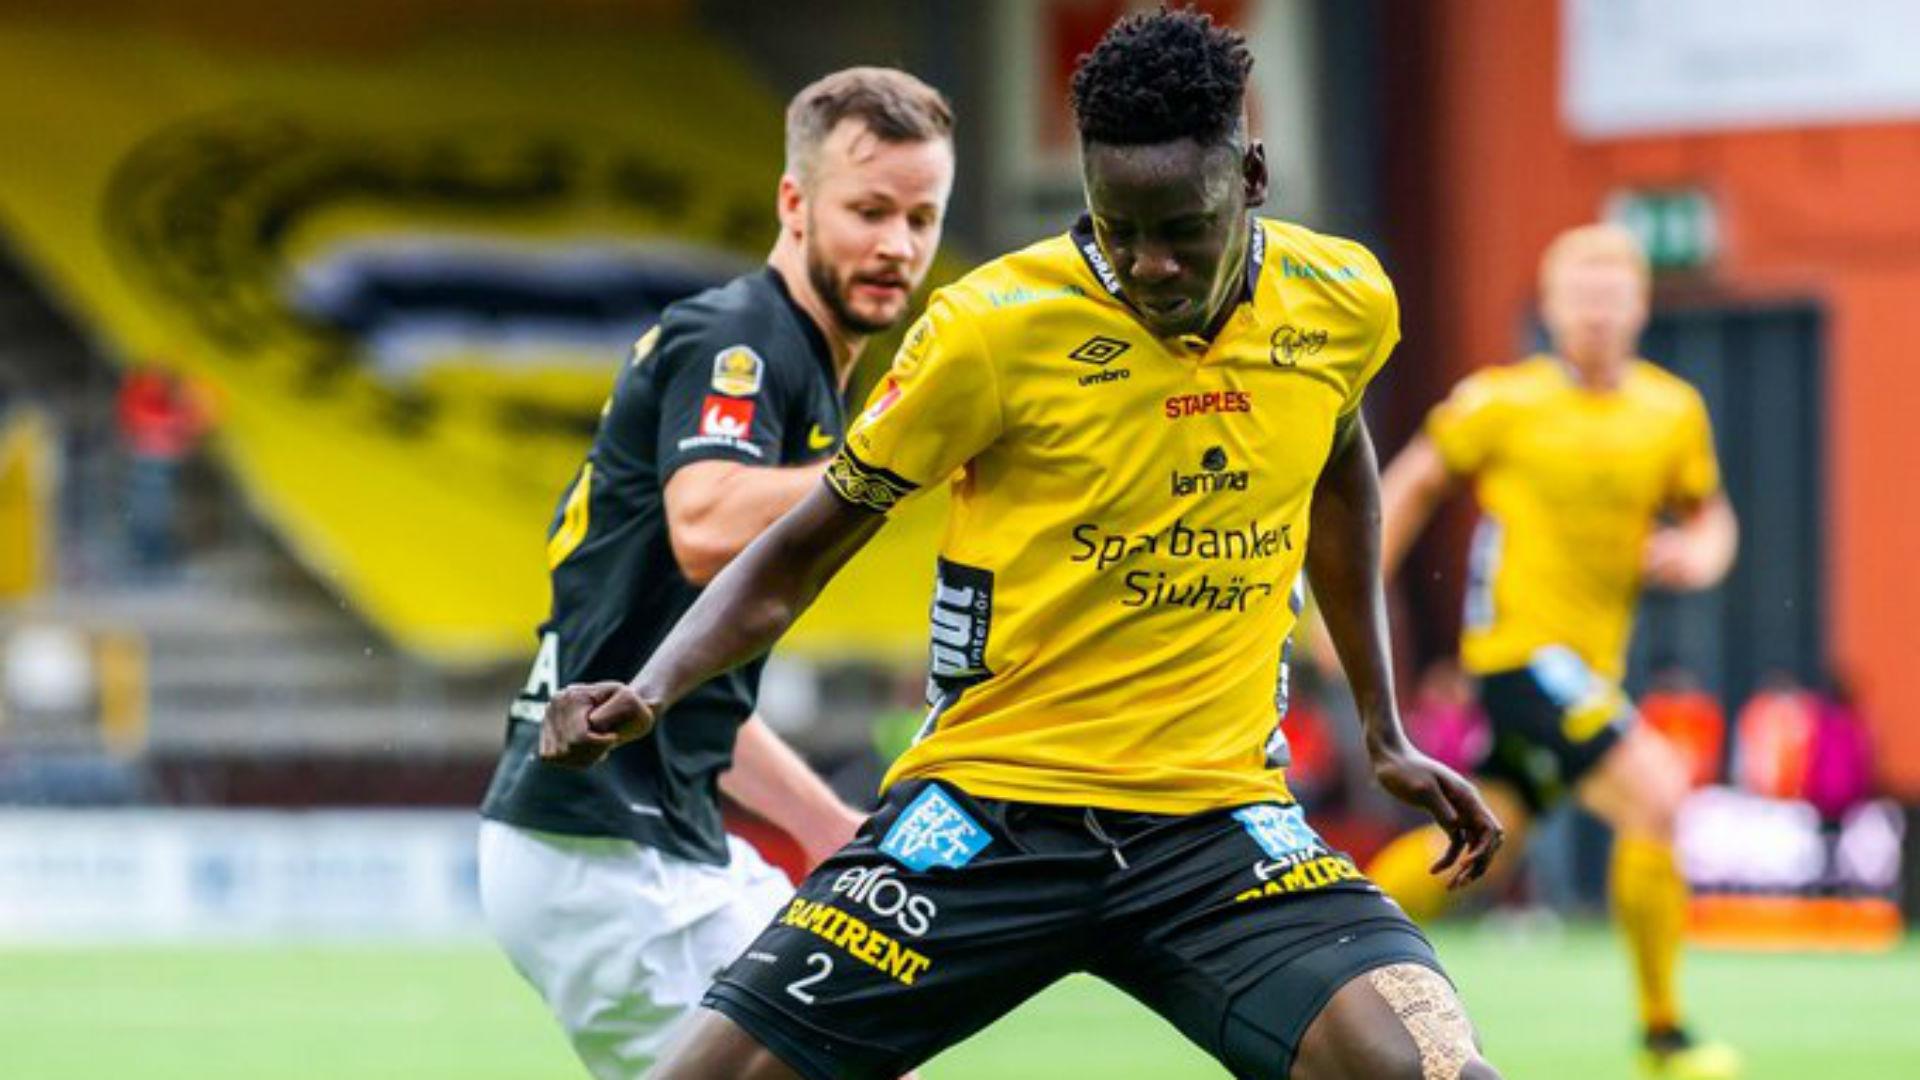 Okumu: Kenya defender returns from injury as IF Elfsborg held in Sweden